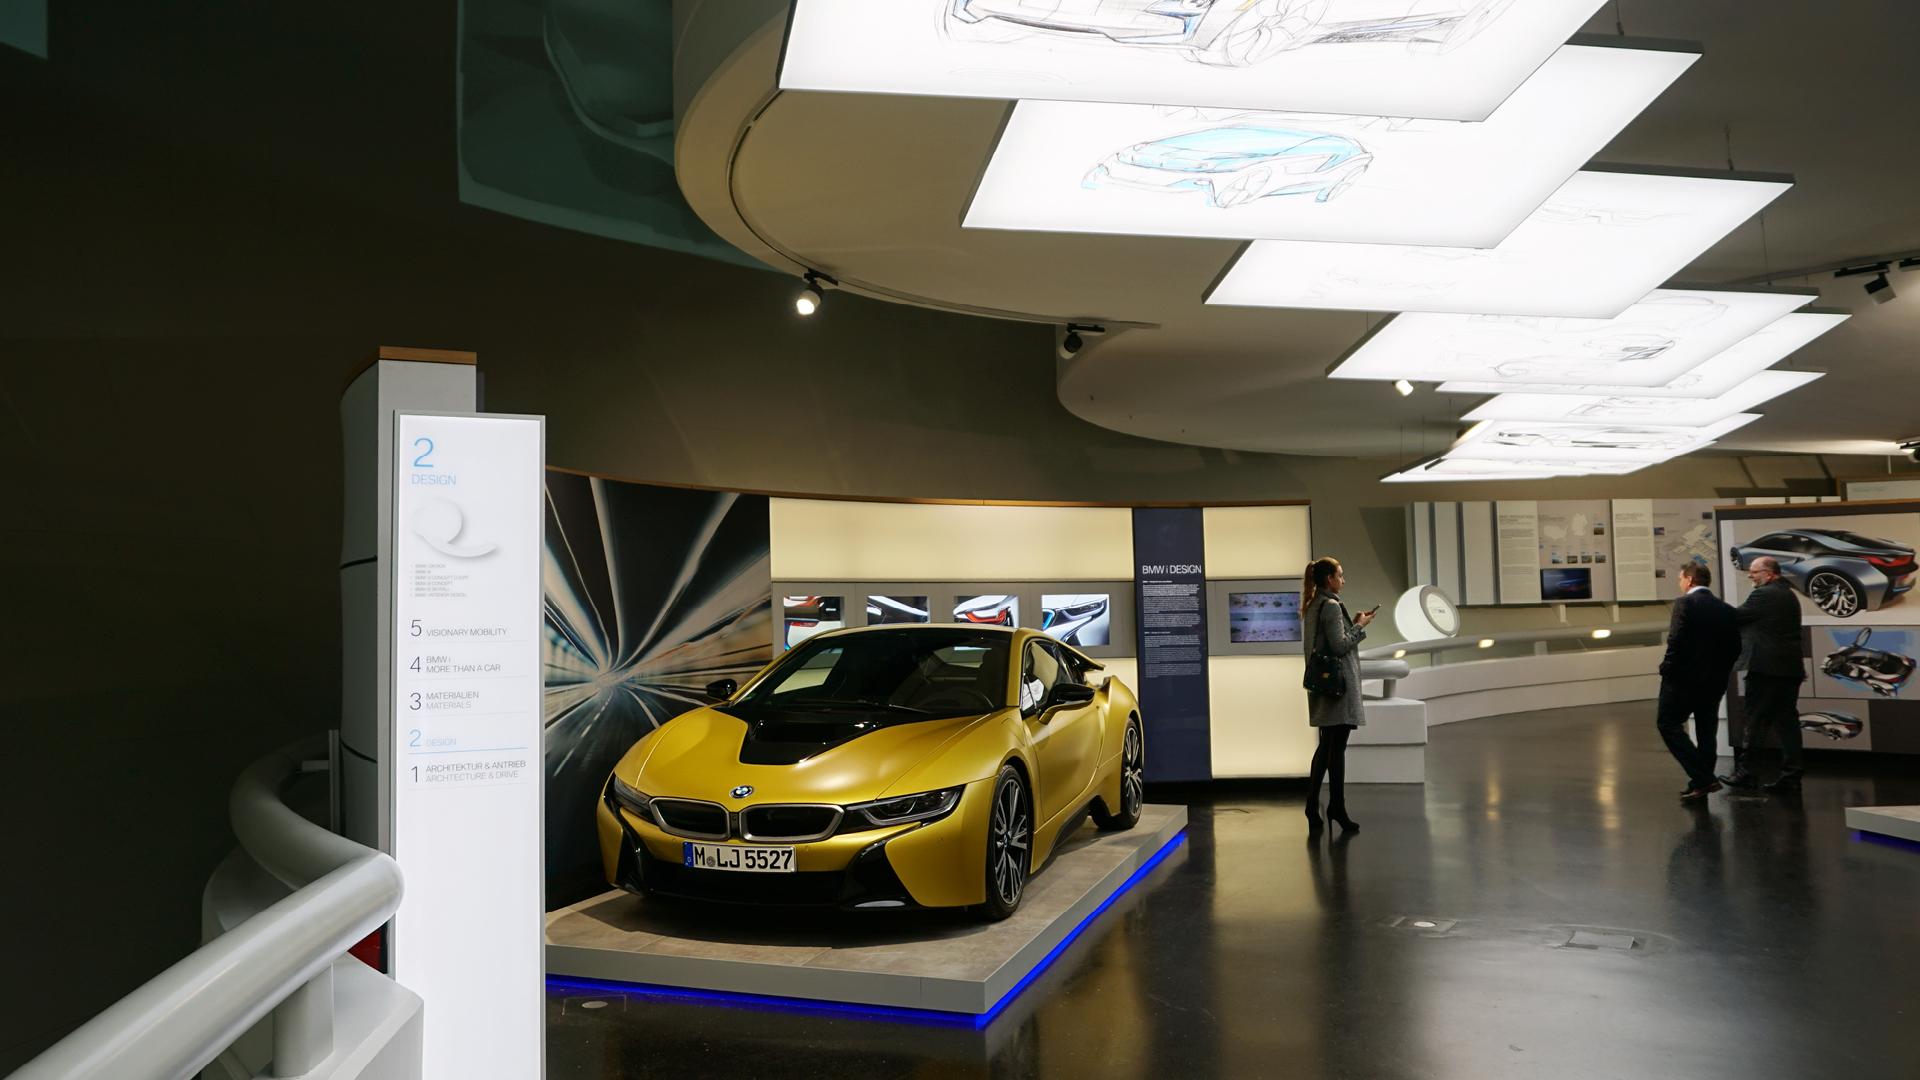 180518_BMWi_Museum_03.jpg